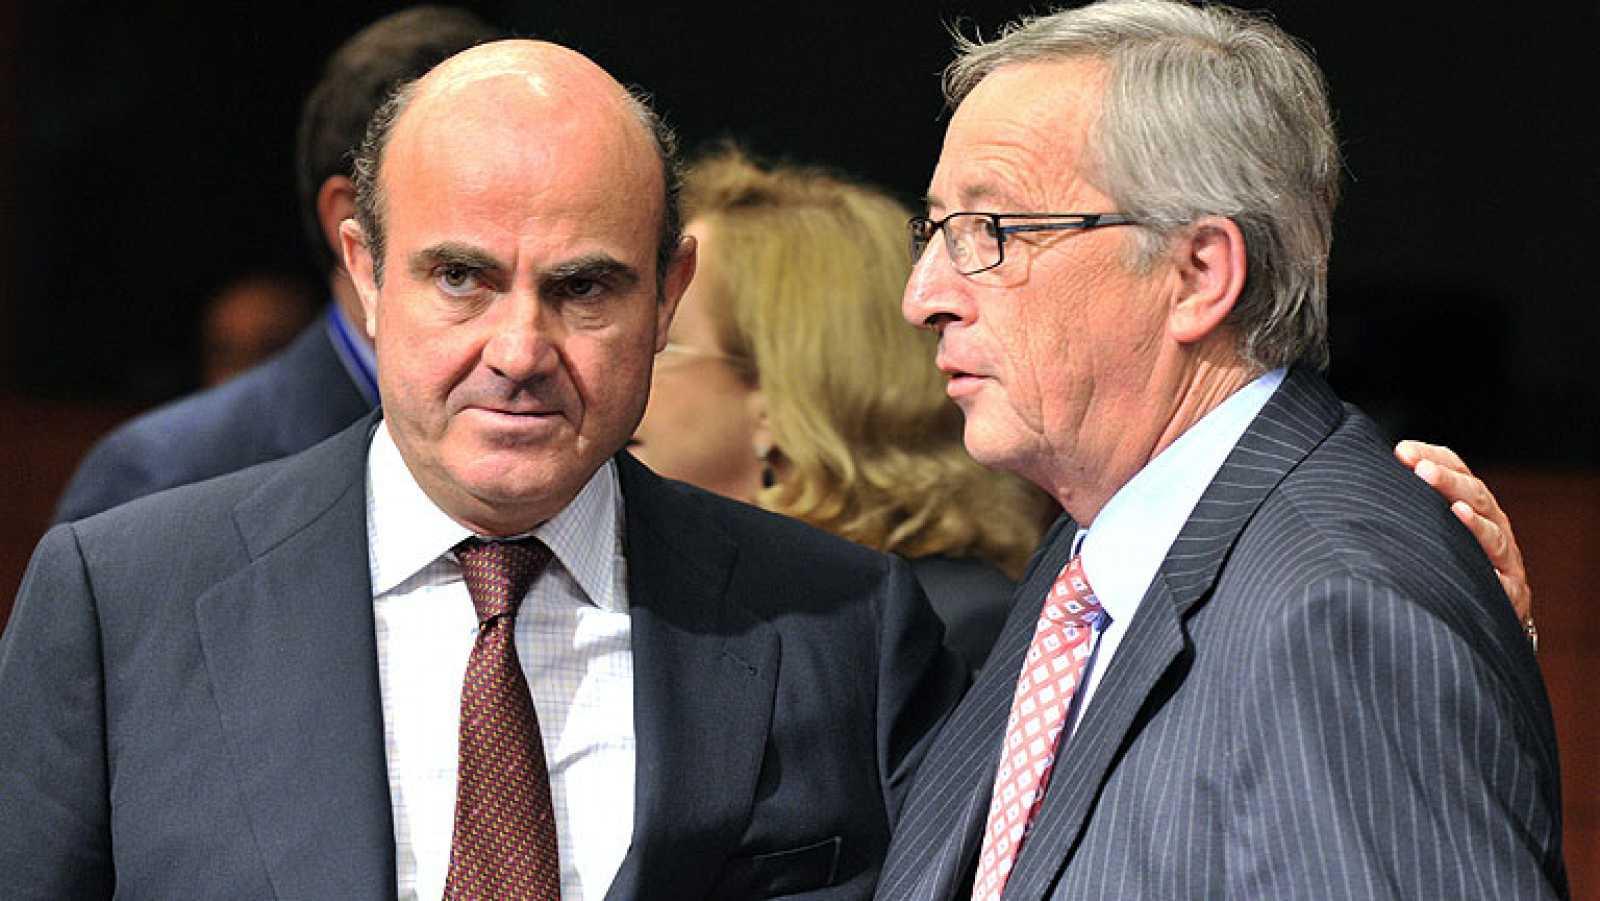 La eurozona moviliza de urgencia 30.000 millones para la banca española